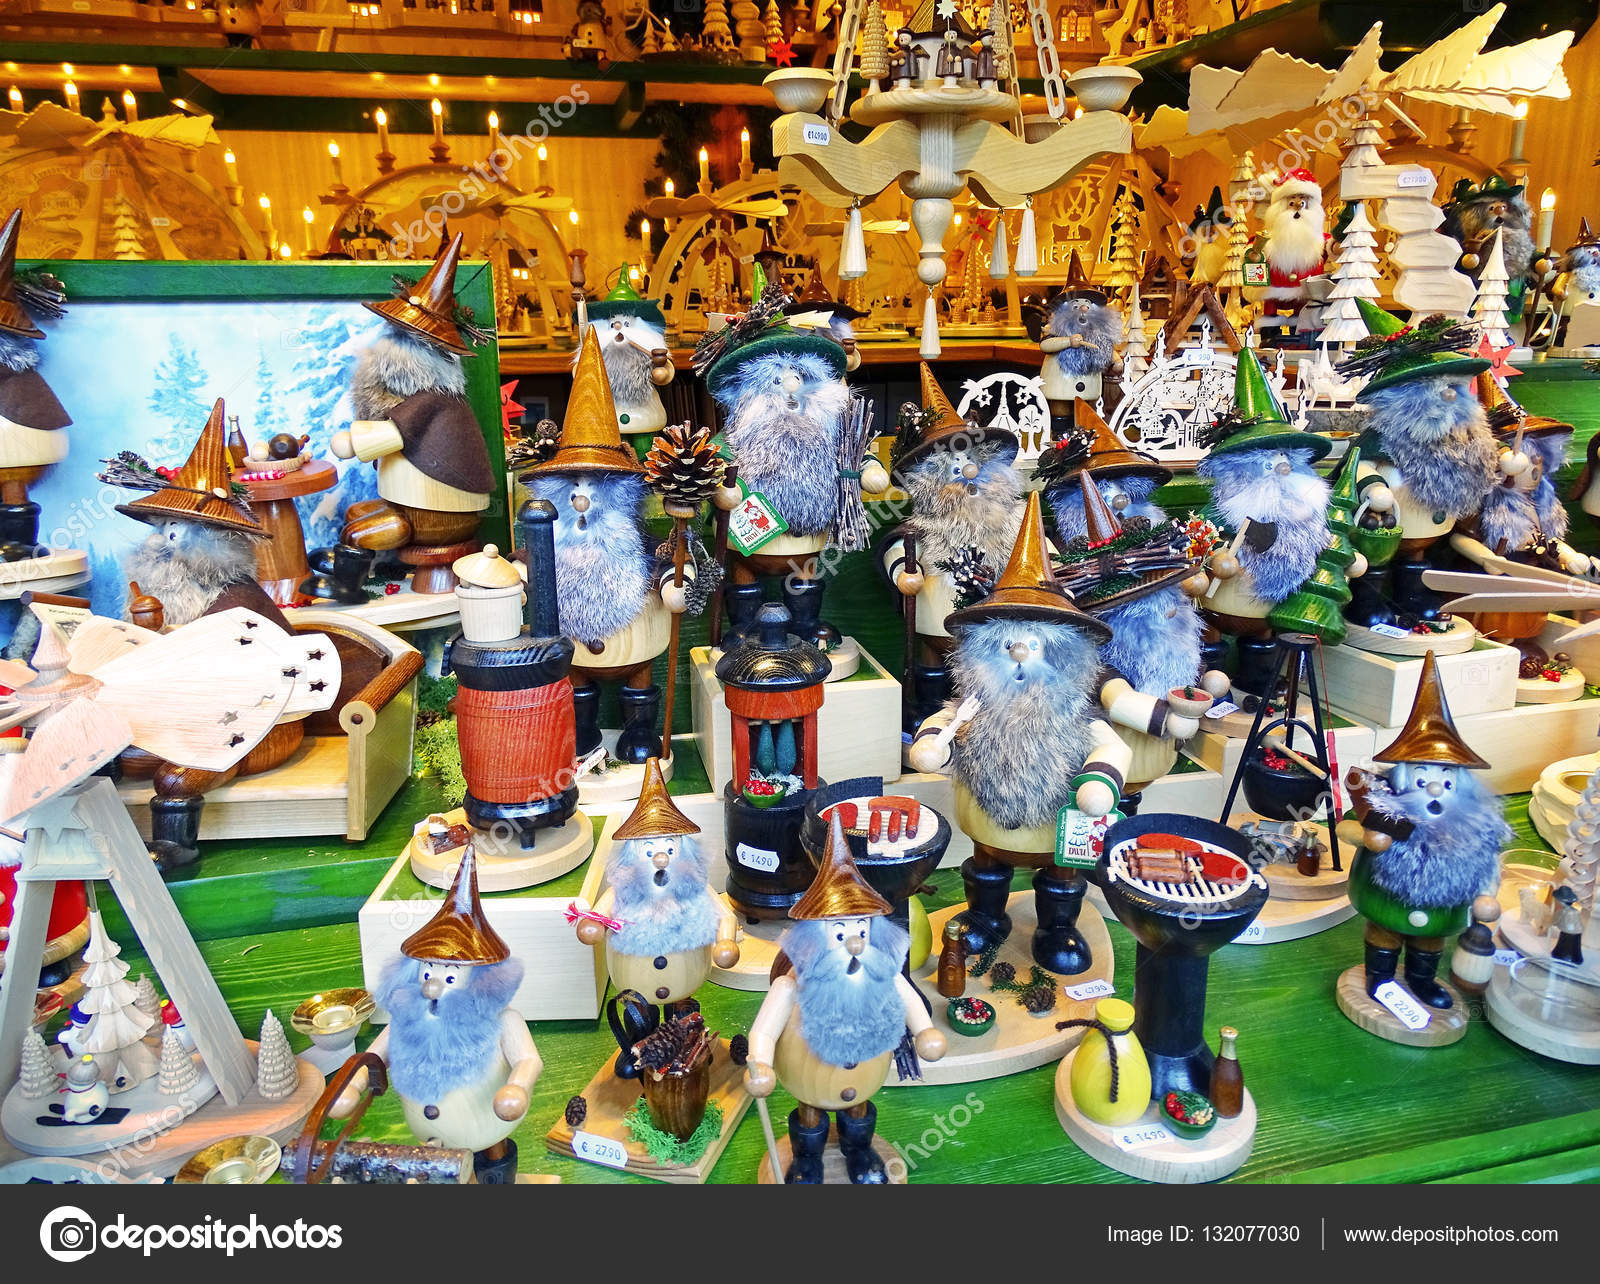 German Christmas Decorations.Christmas Market With Traditional German Christmas